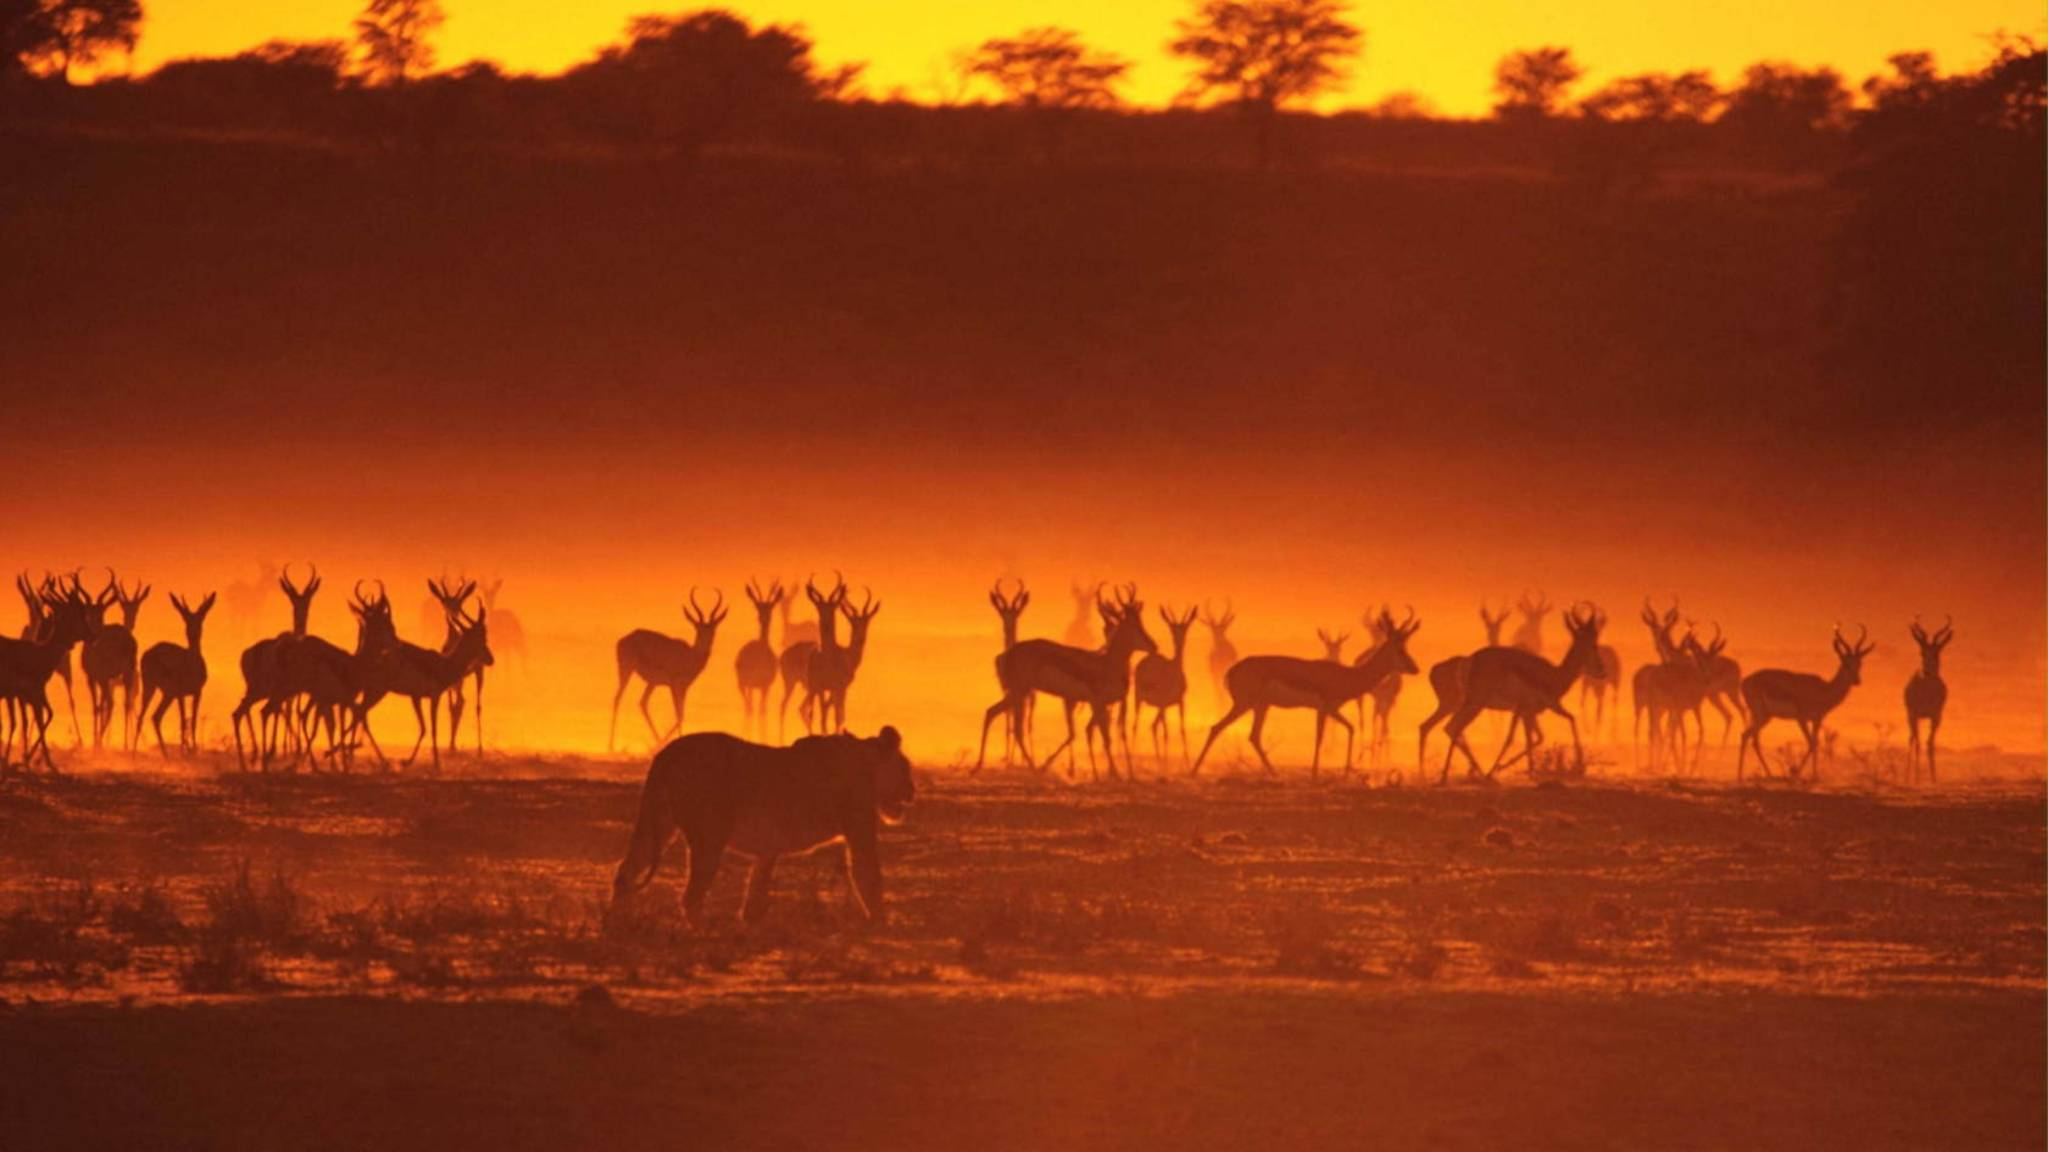 antelope_lion_hunting_animals_walk_sunset_silhouette_53022_3840x2160